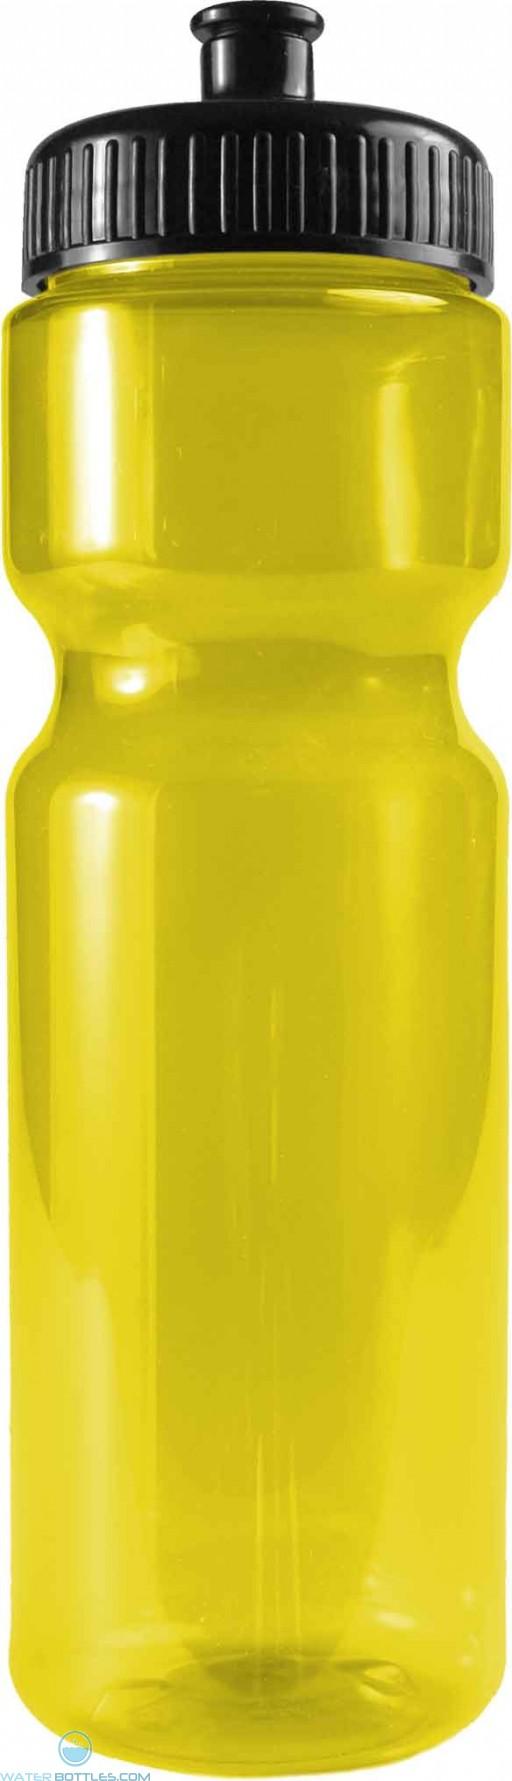 The Olympian - 28 oz. Transparent Color Bottles-Transparent--Yellow